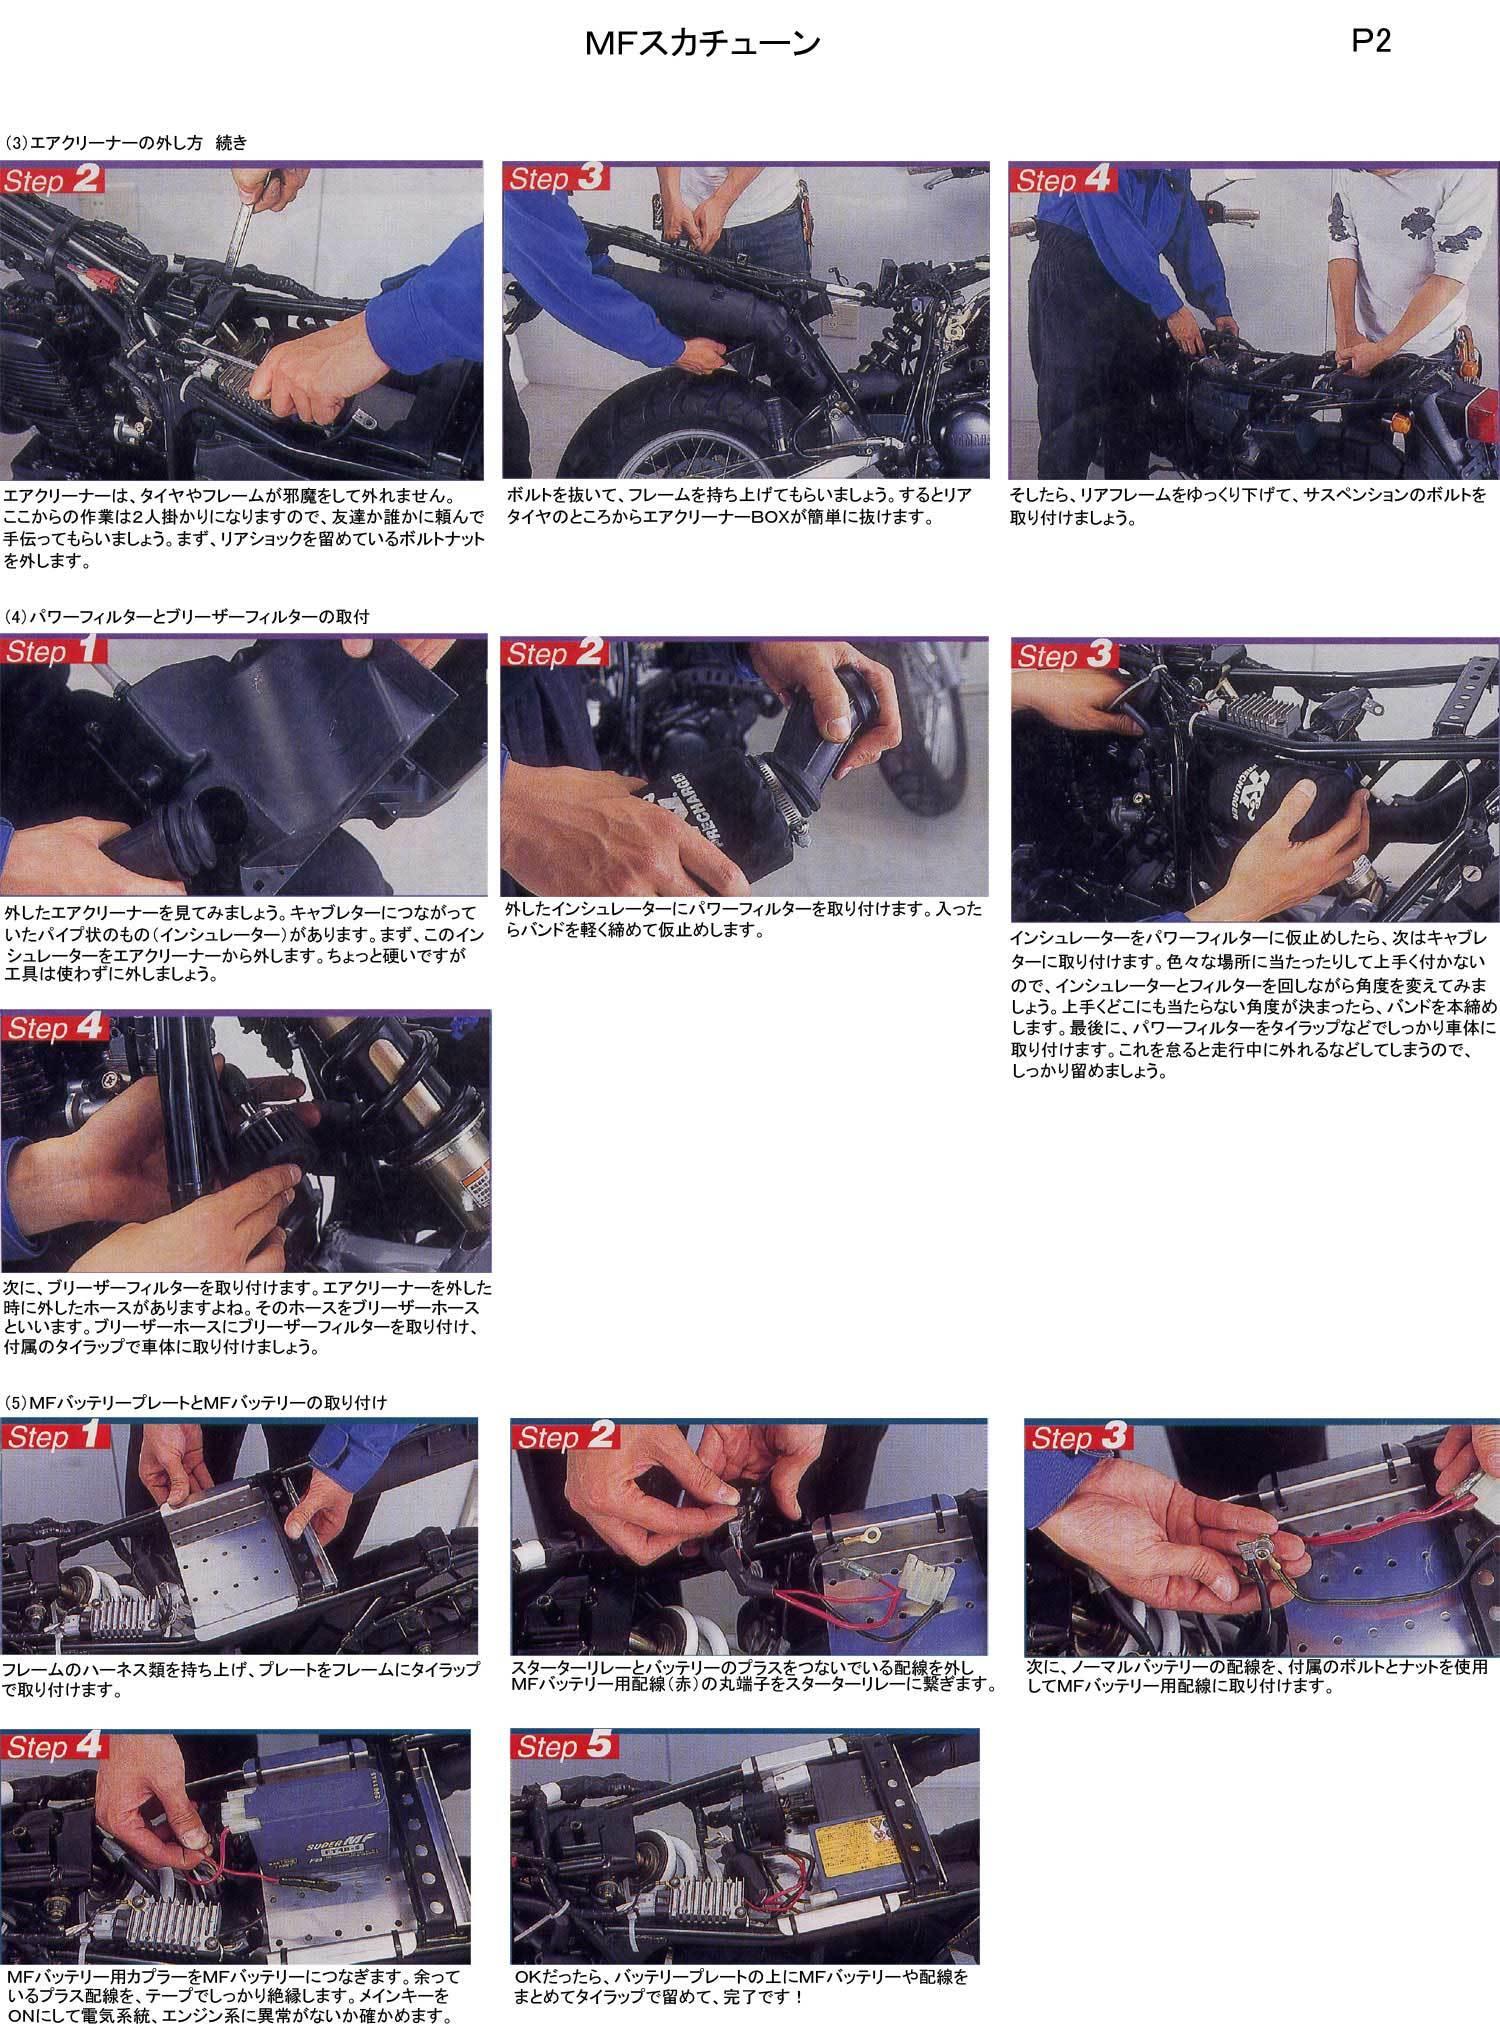 TW200/225 ミニMFバッテリースカチューン手順_d0067418_09495172.jpg